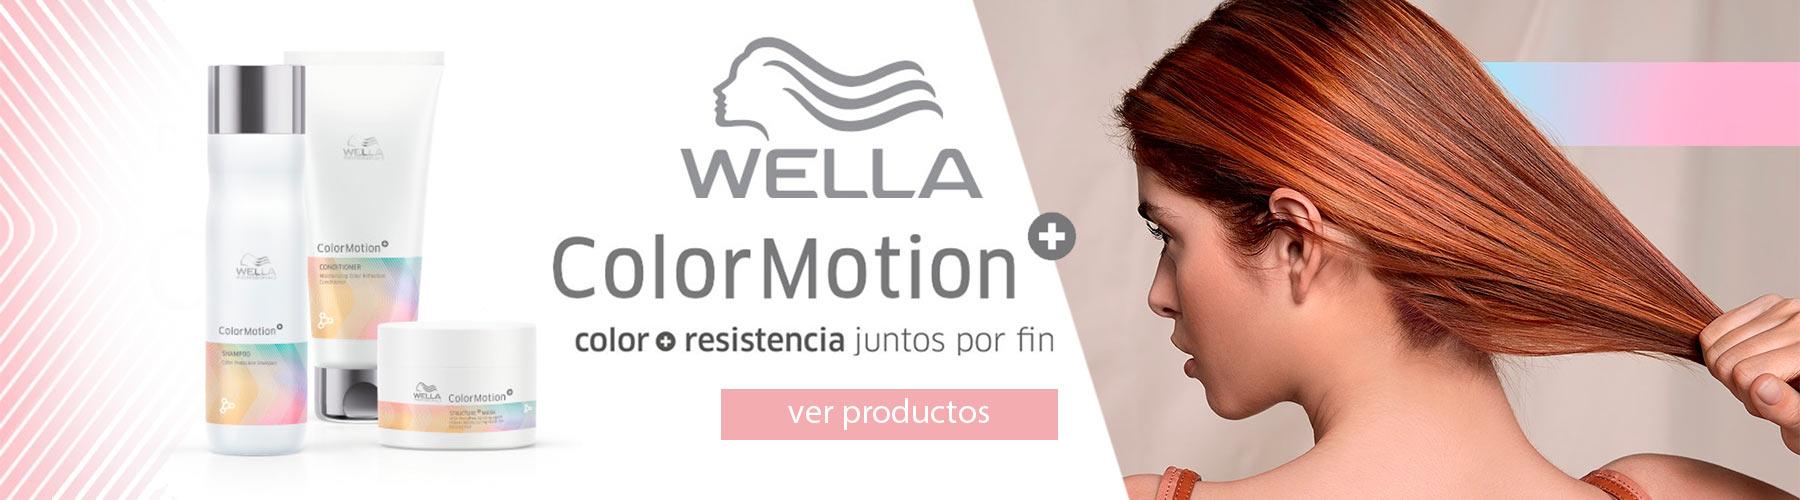 Color motion de Wella